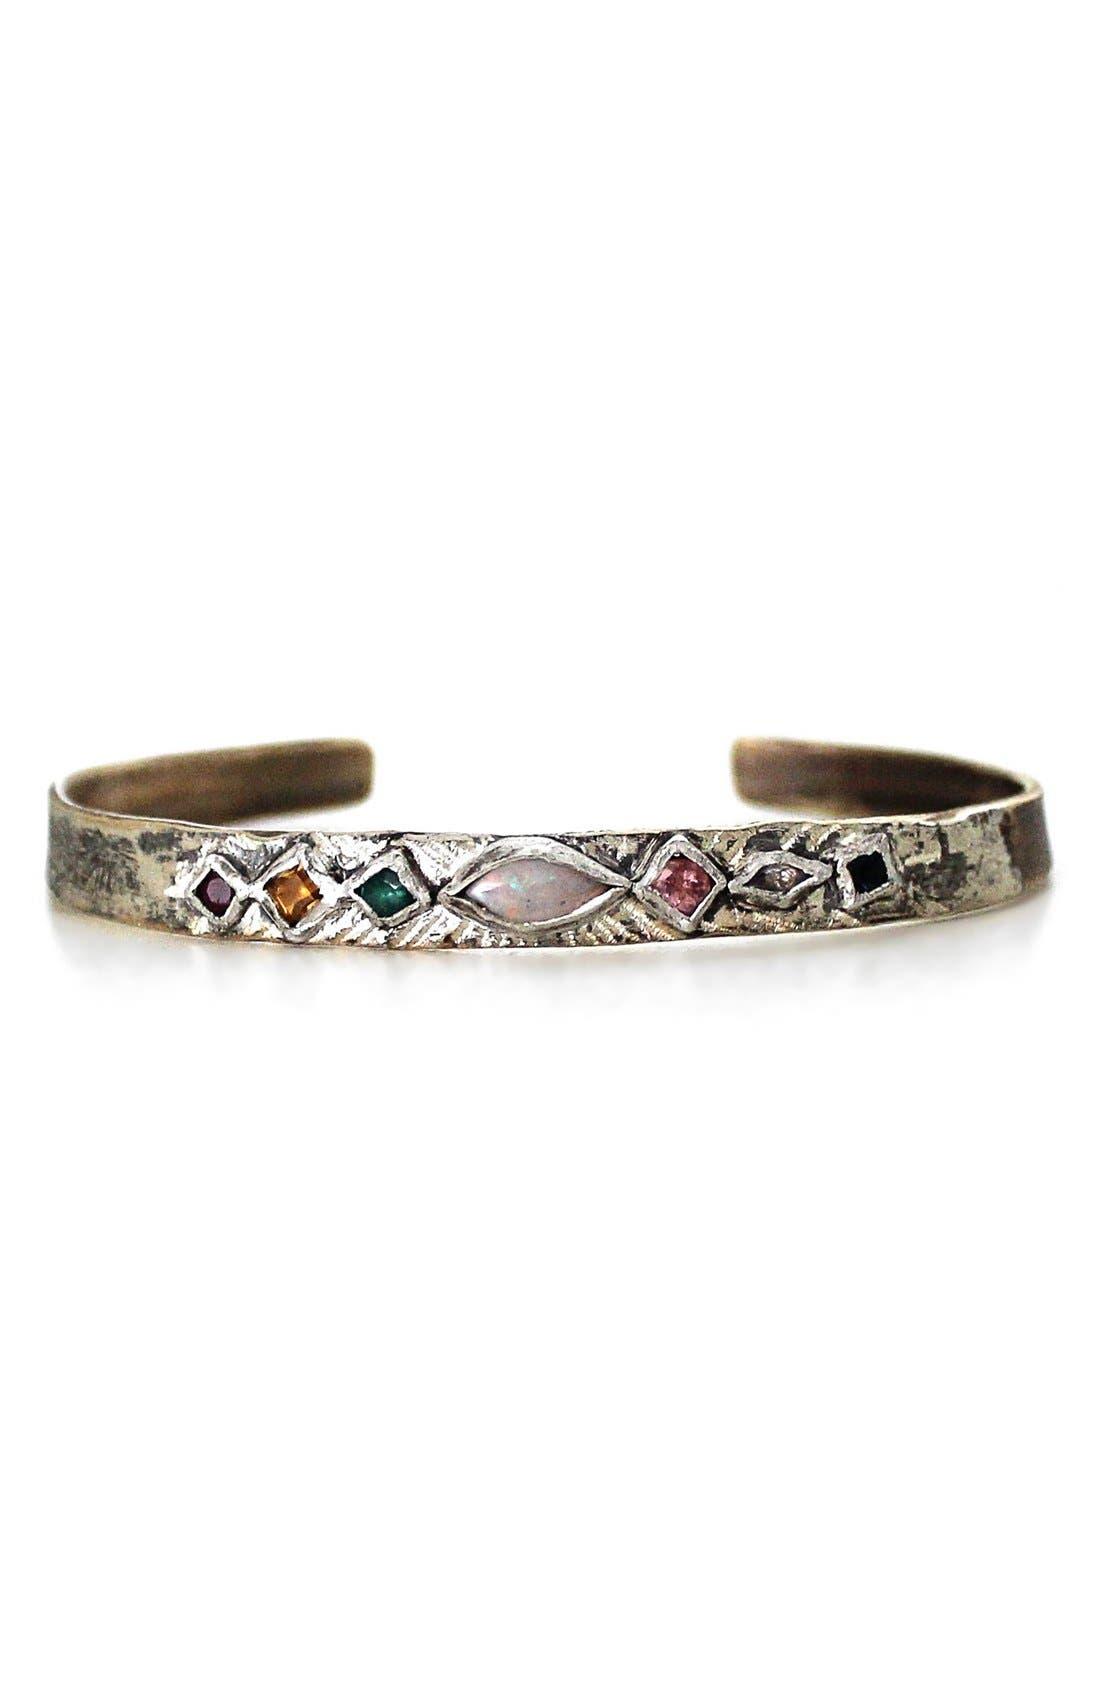 Main Image - Franny E Jewelry Mixed Gem Cuff Bracelet